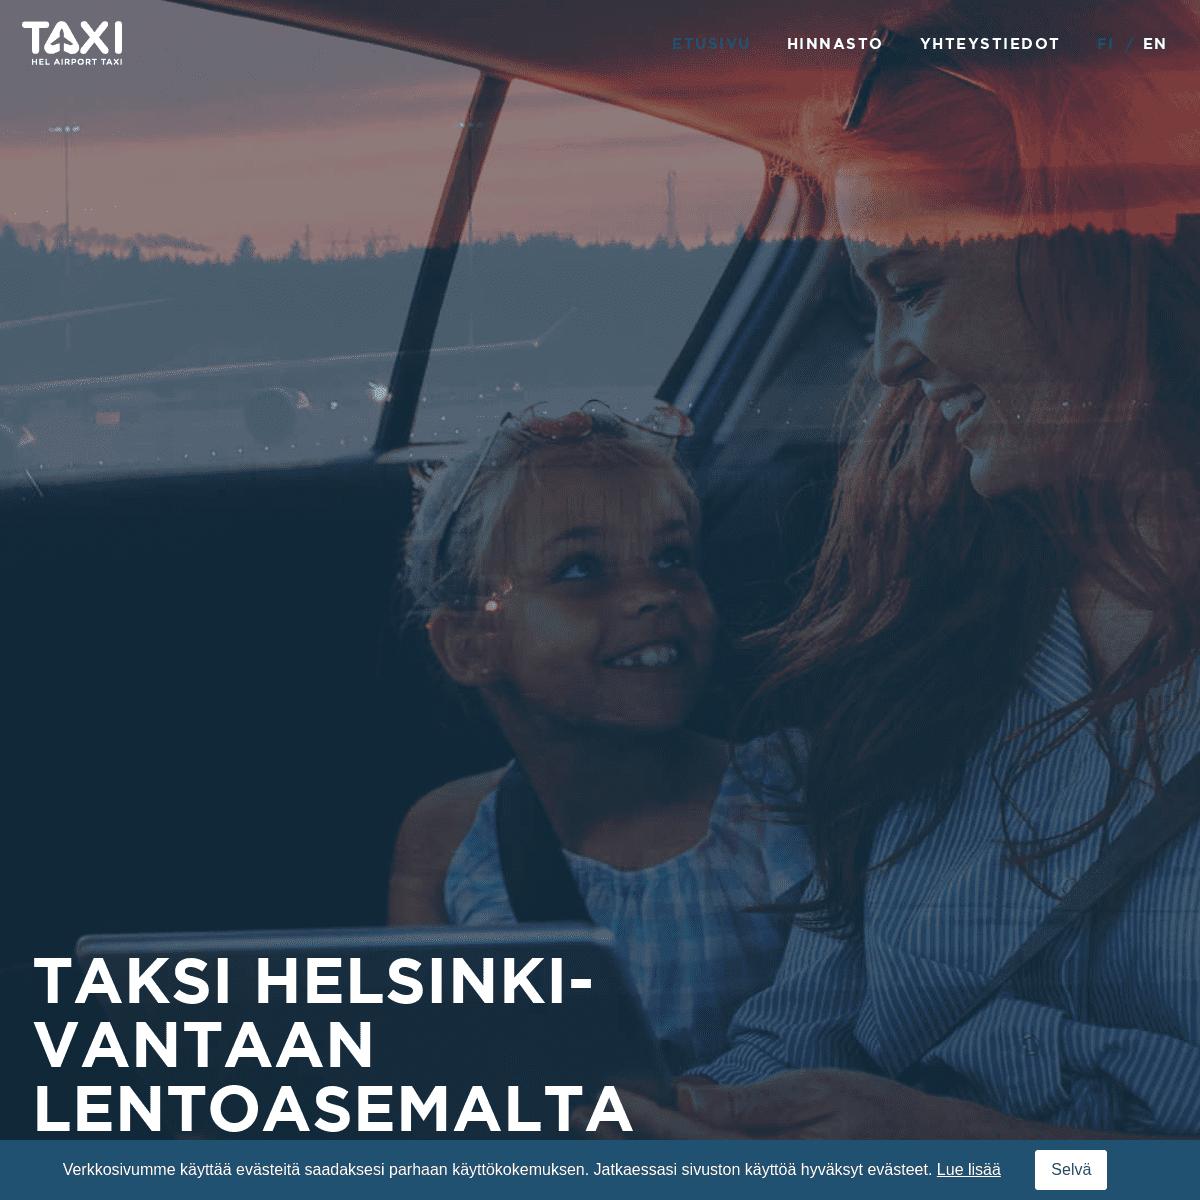 Etusivu - Helsinki Airport Taxi